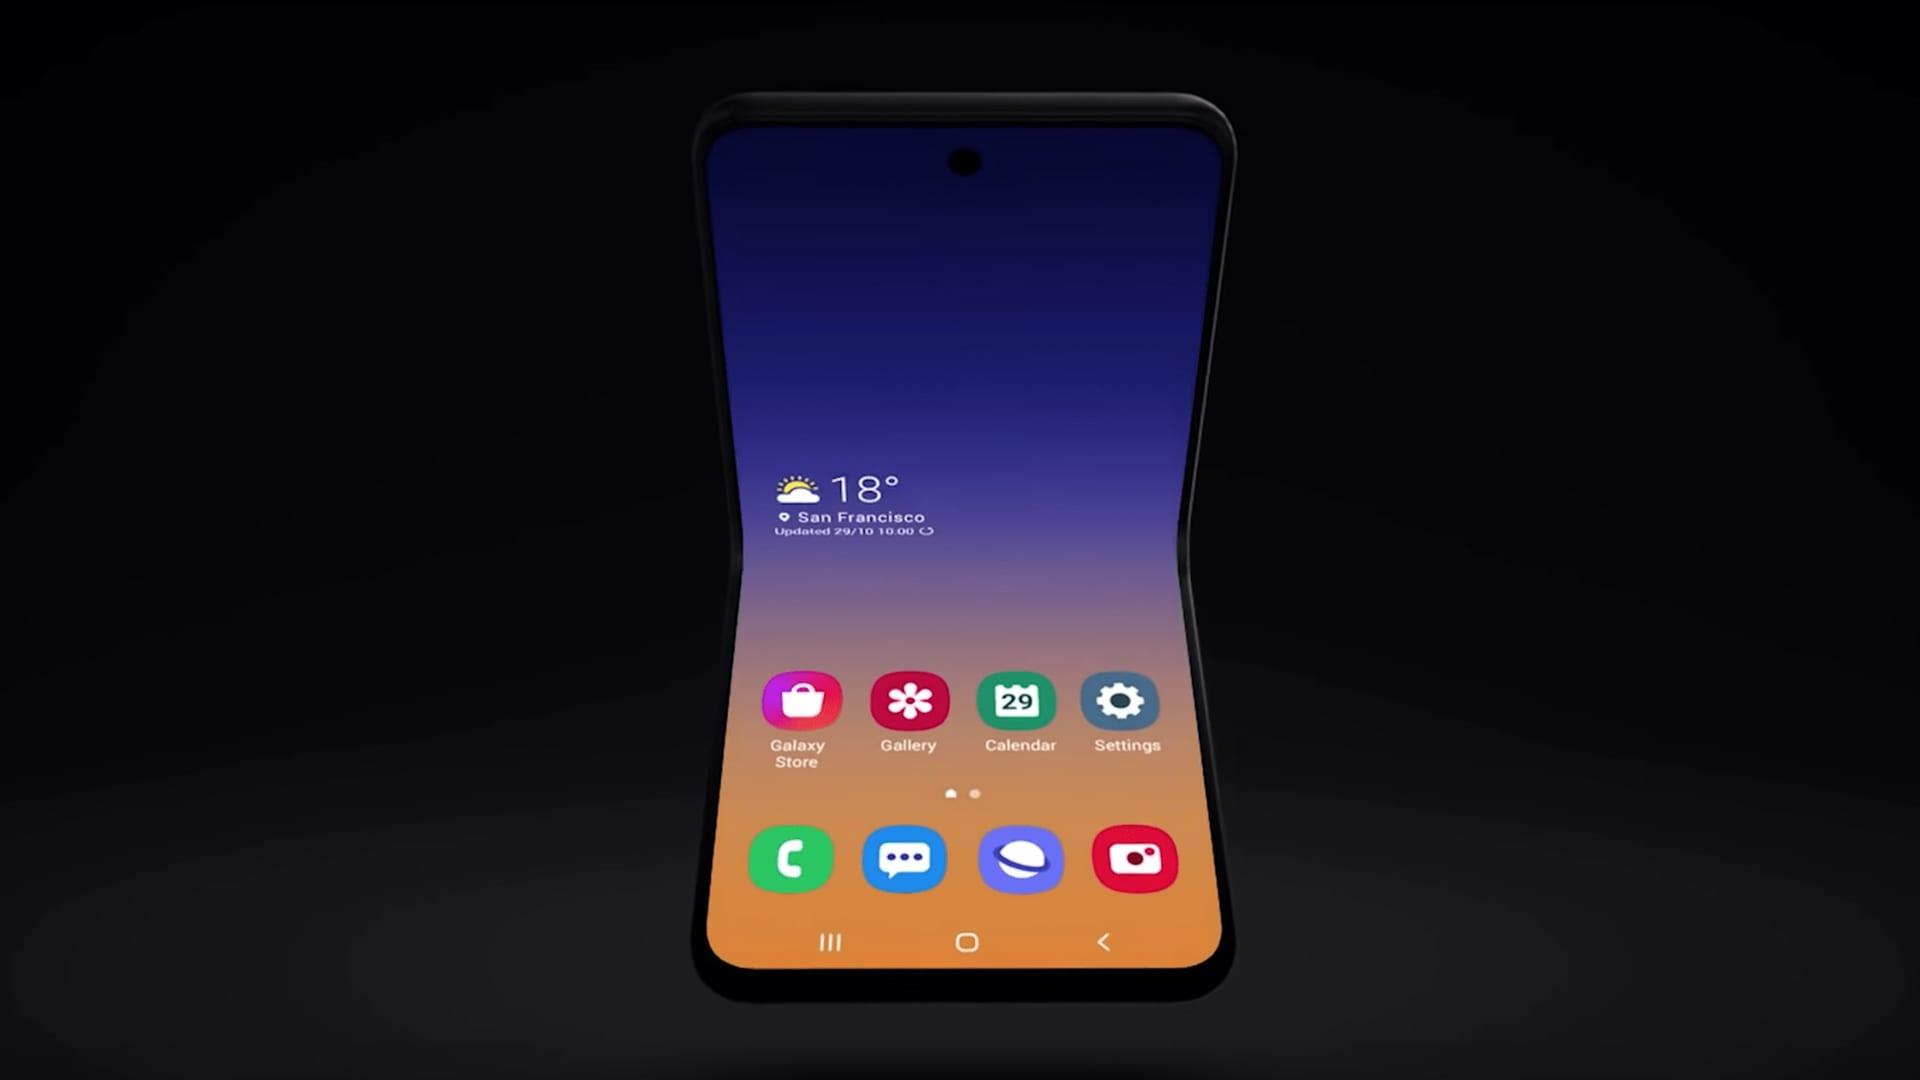 توقعات بقدوم هاتف GALAXY FOLD 2 بسعر أقل من 1000 دولار